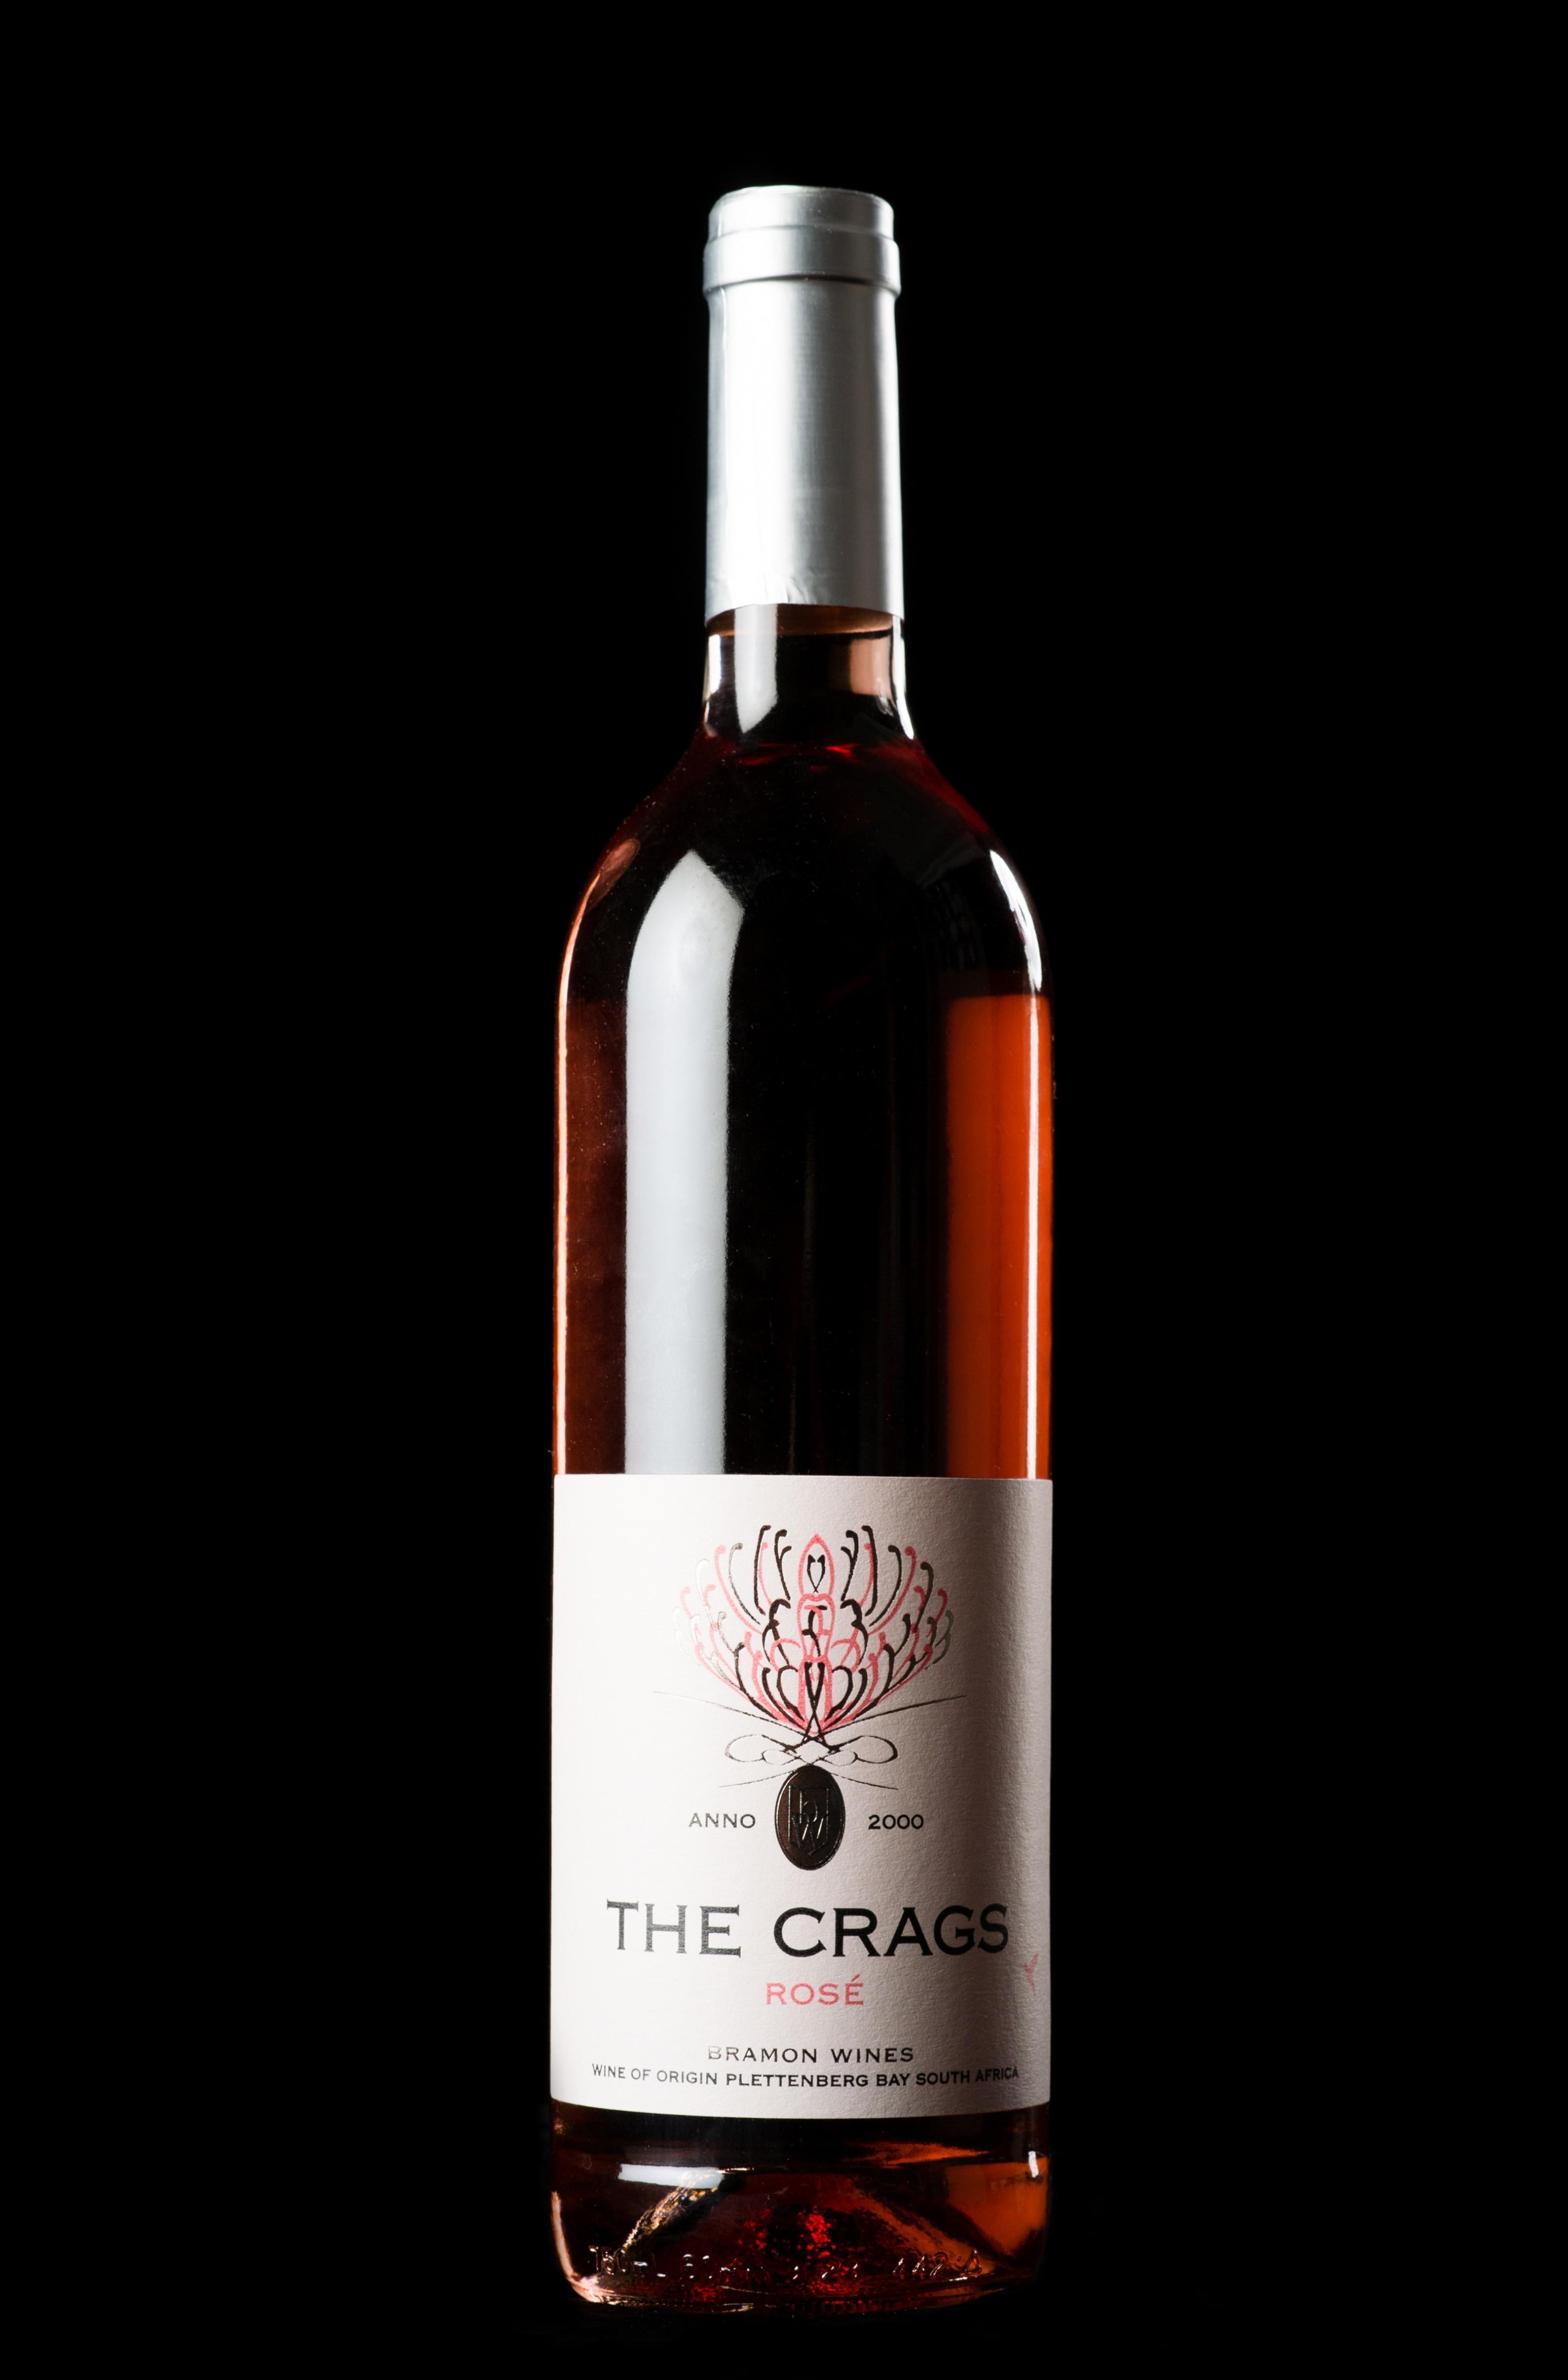 The Crags Rose - Shiraz/Pinot Noir 2018 7